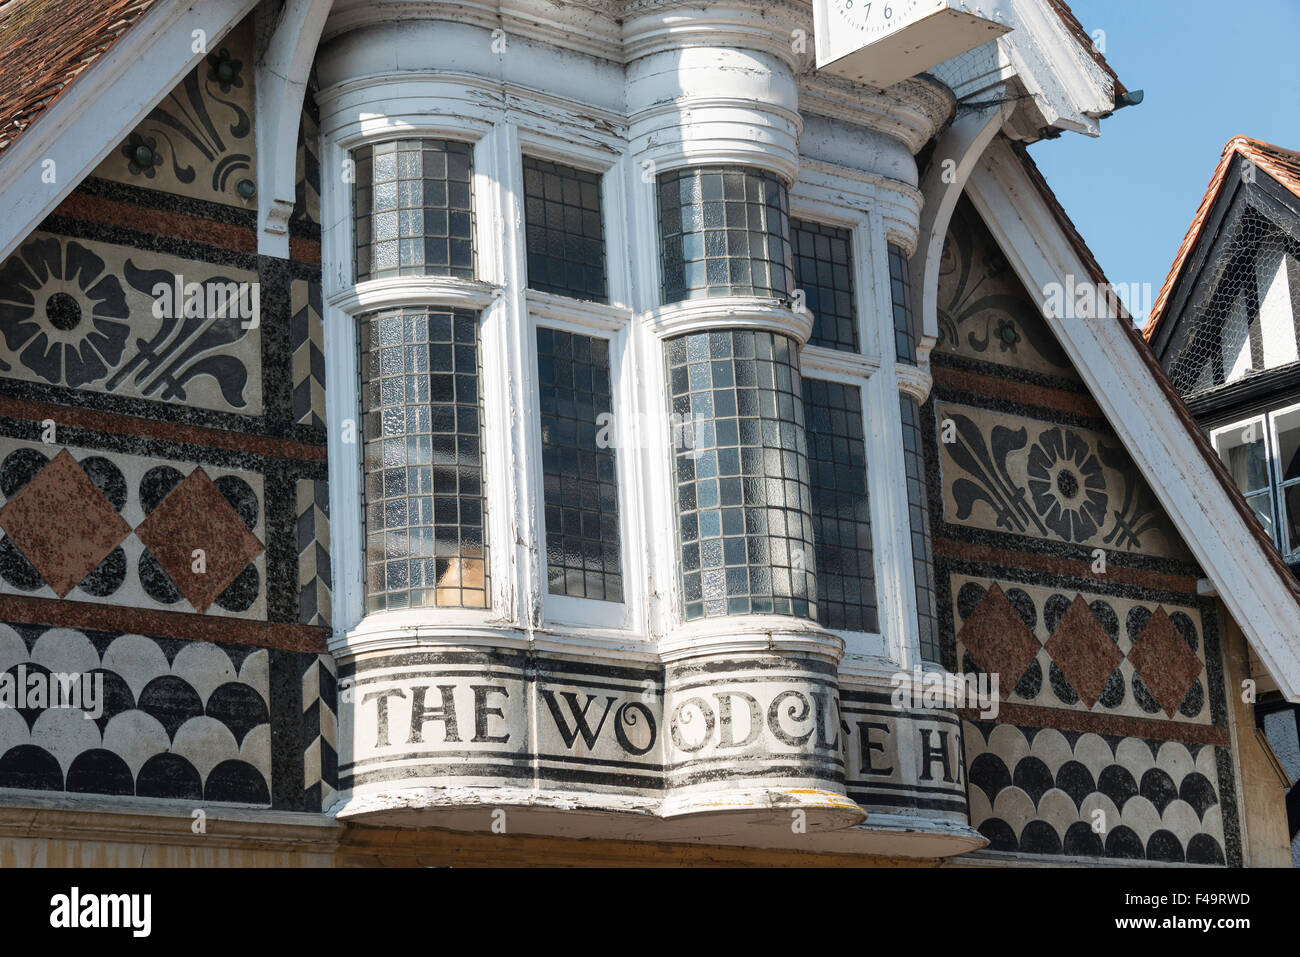 Bay windows of Woodclyffe Hall, Wargrave High Street, Wargrave, Berkshire, England, United KIngdom - Stock Image